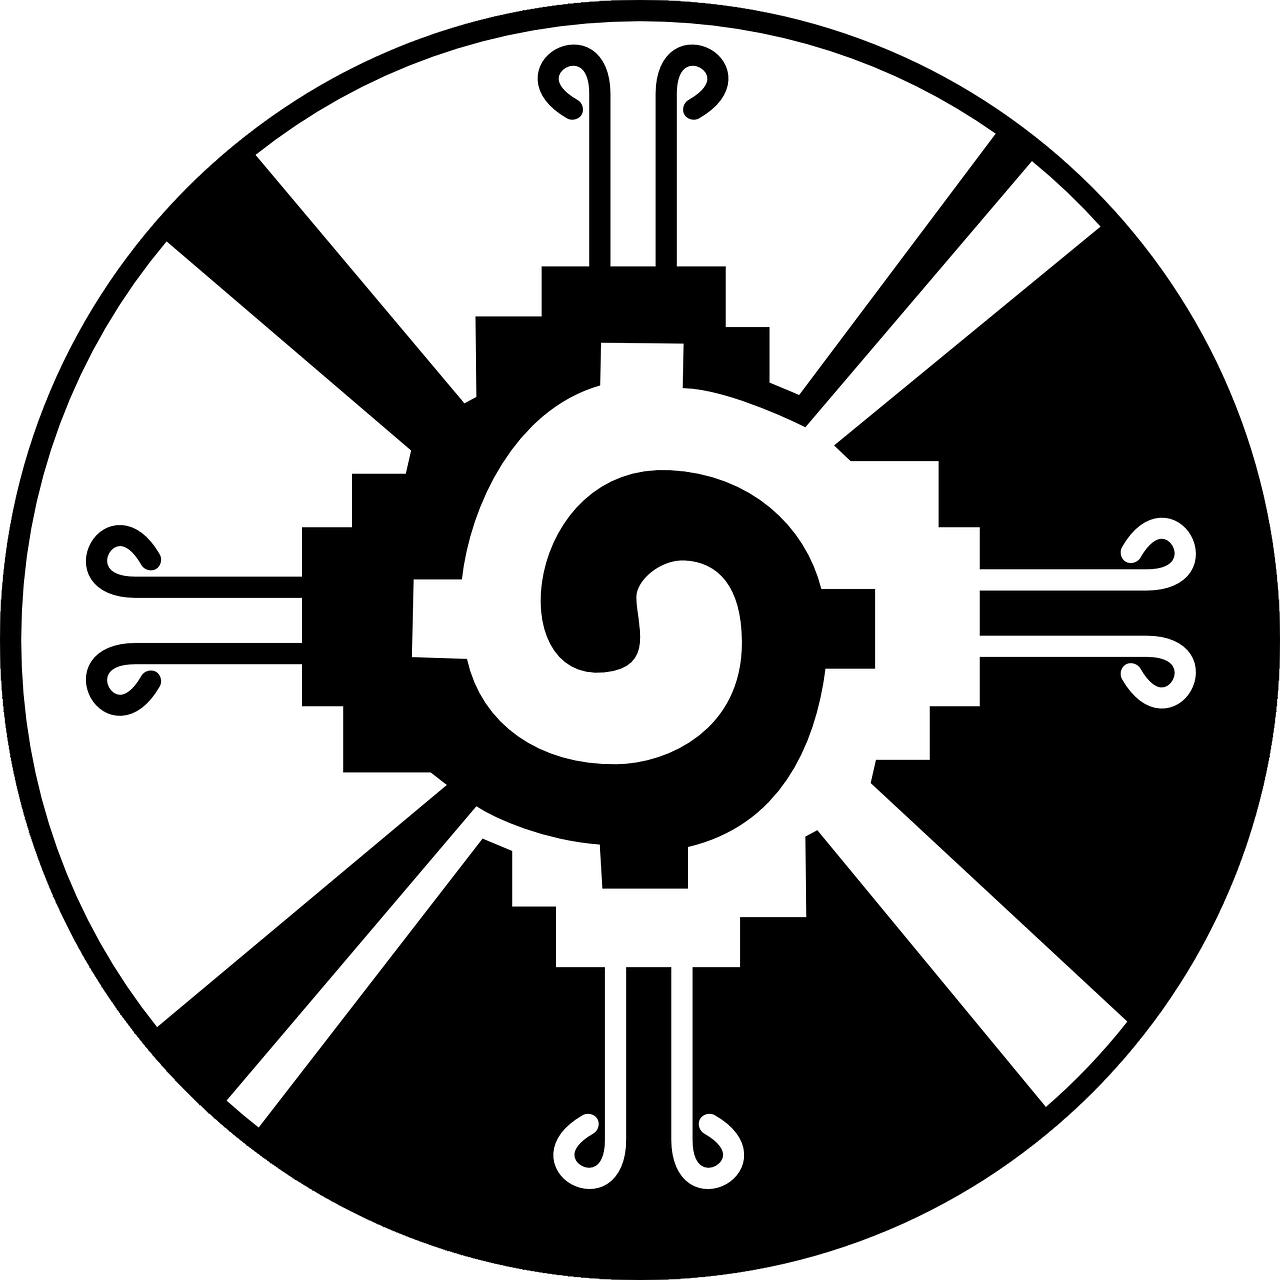 Fox clipart aztec. Free image on pixabay